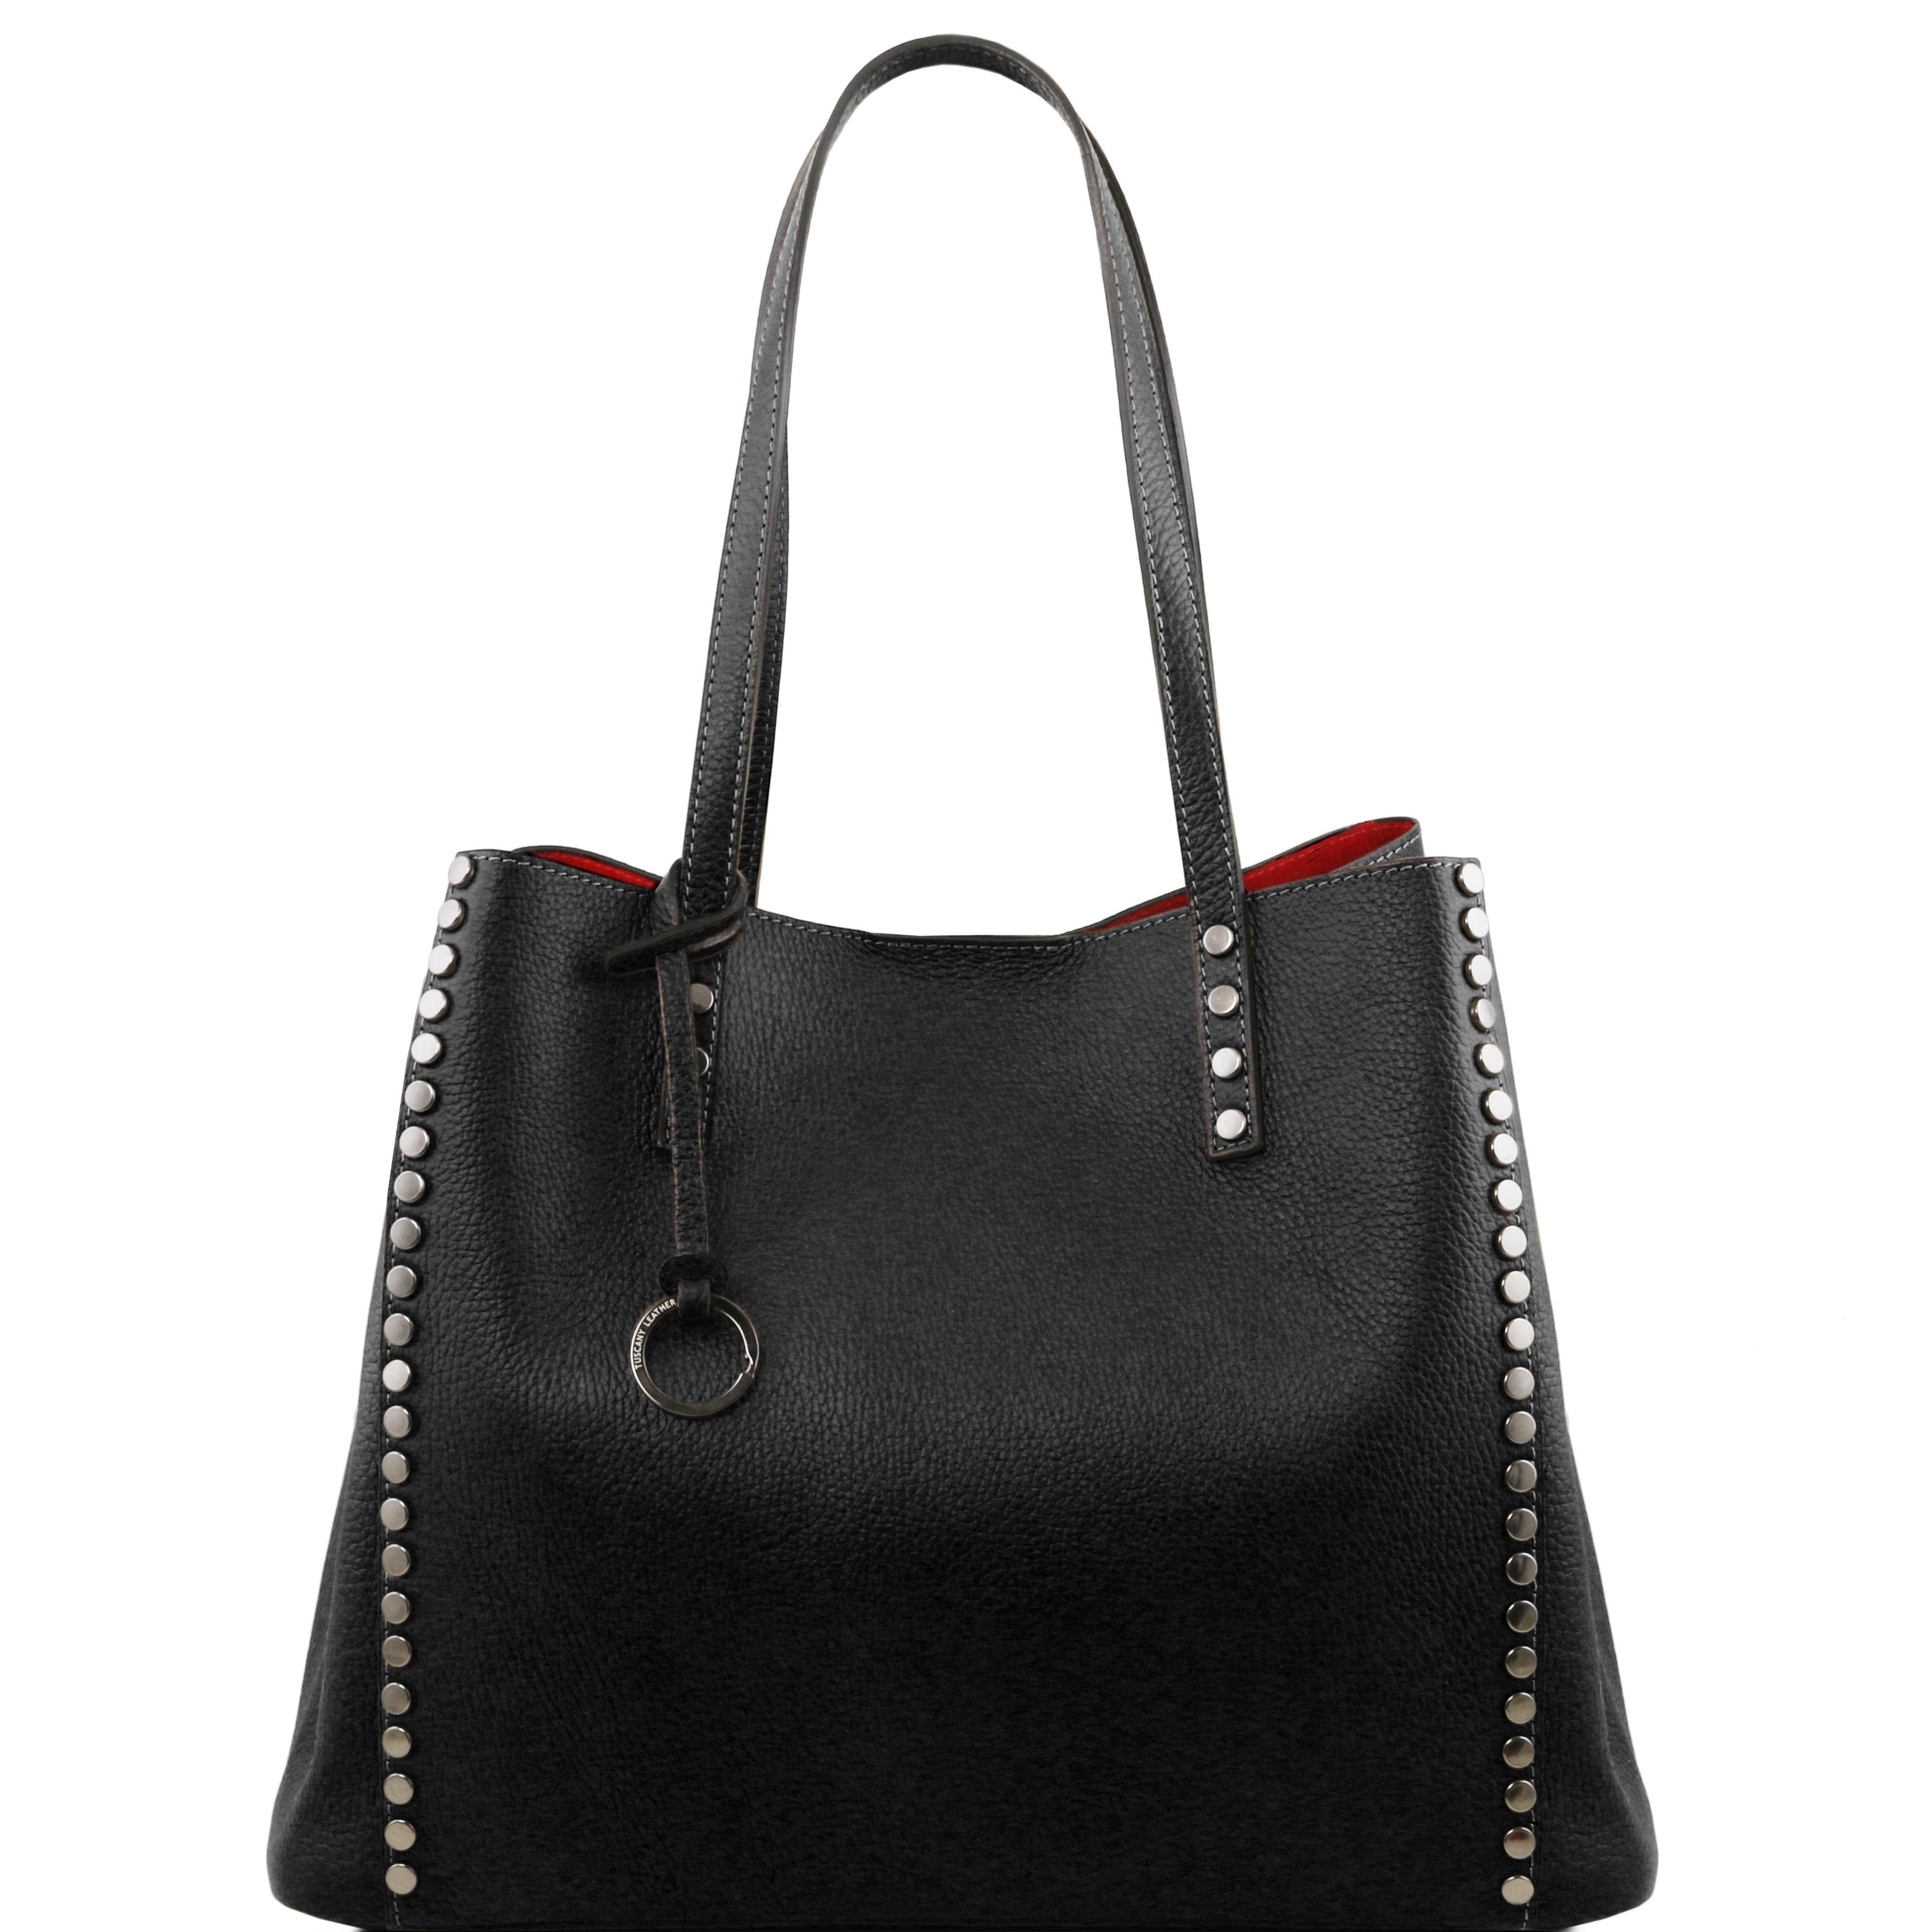 TL BAG - Geanta shopper din piele soft neagra